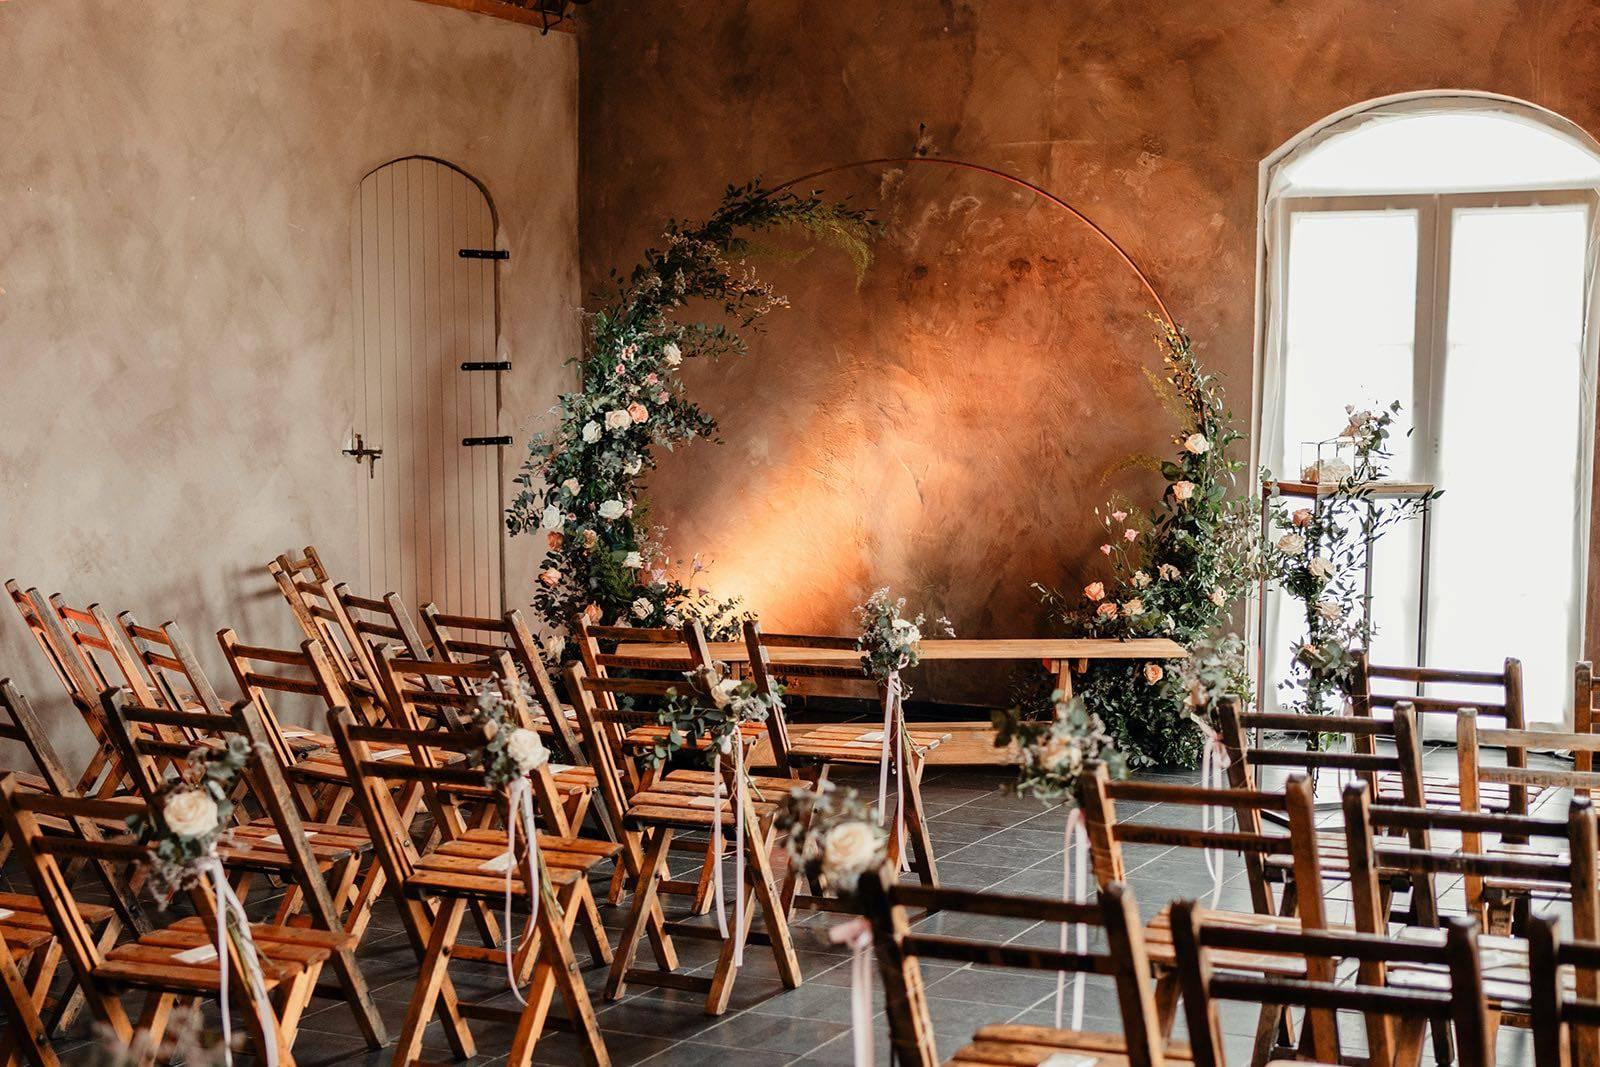 Maison Fleurie - Fotograaf zelfgetrokken - House of Weddings - 9